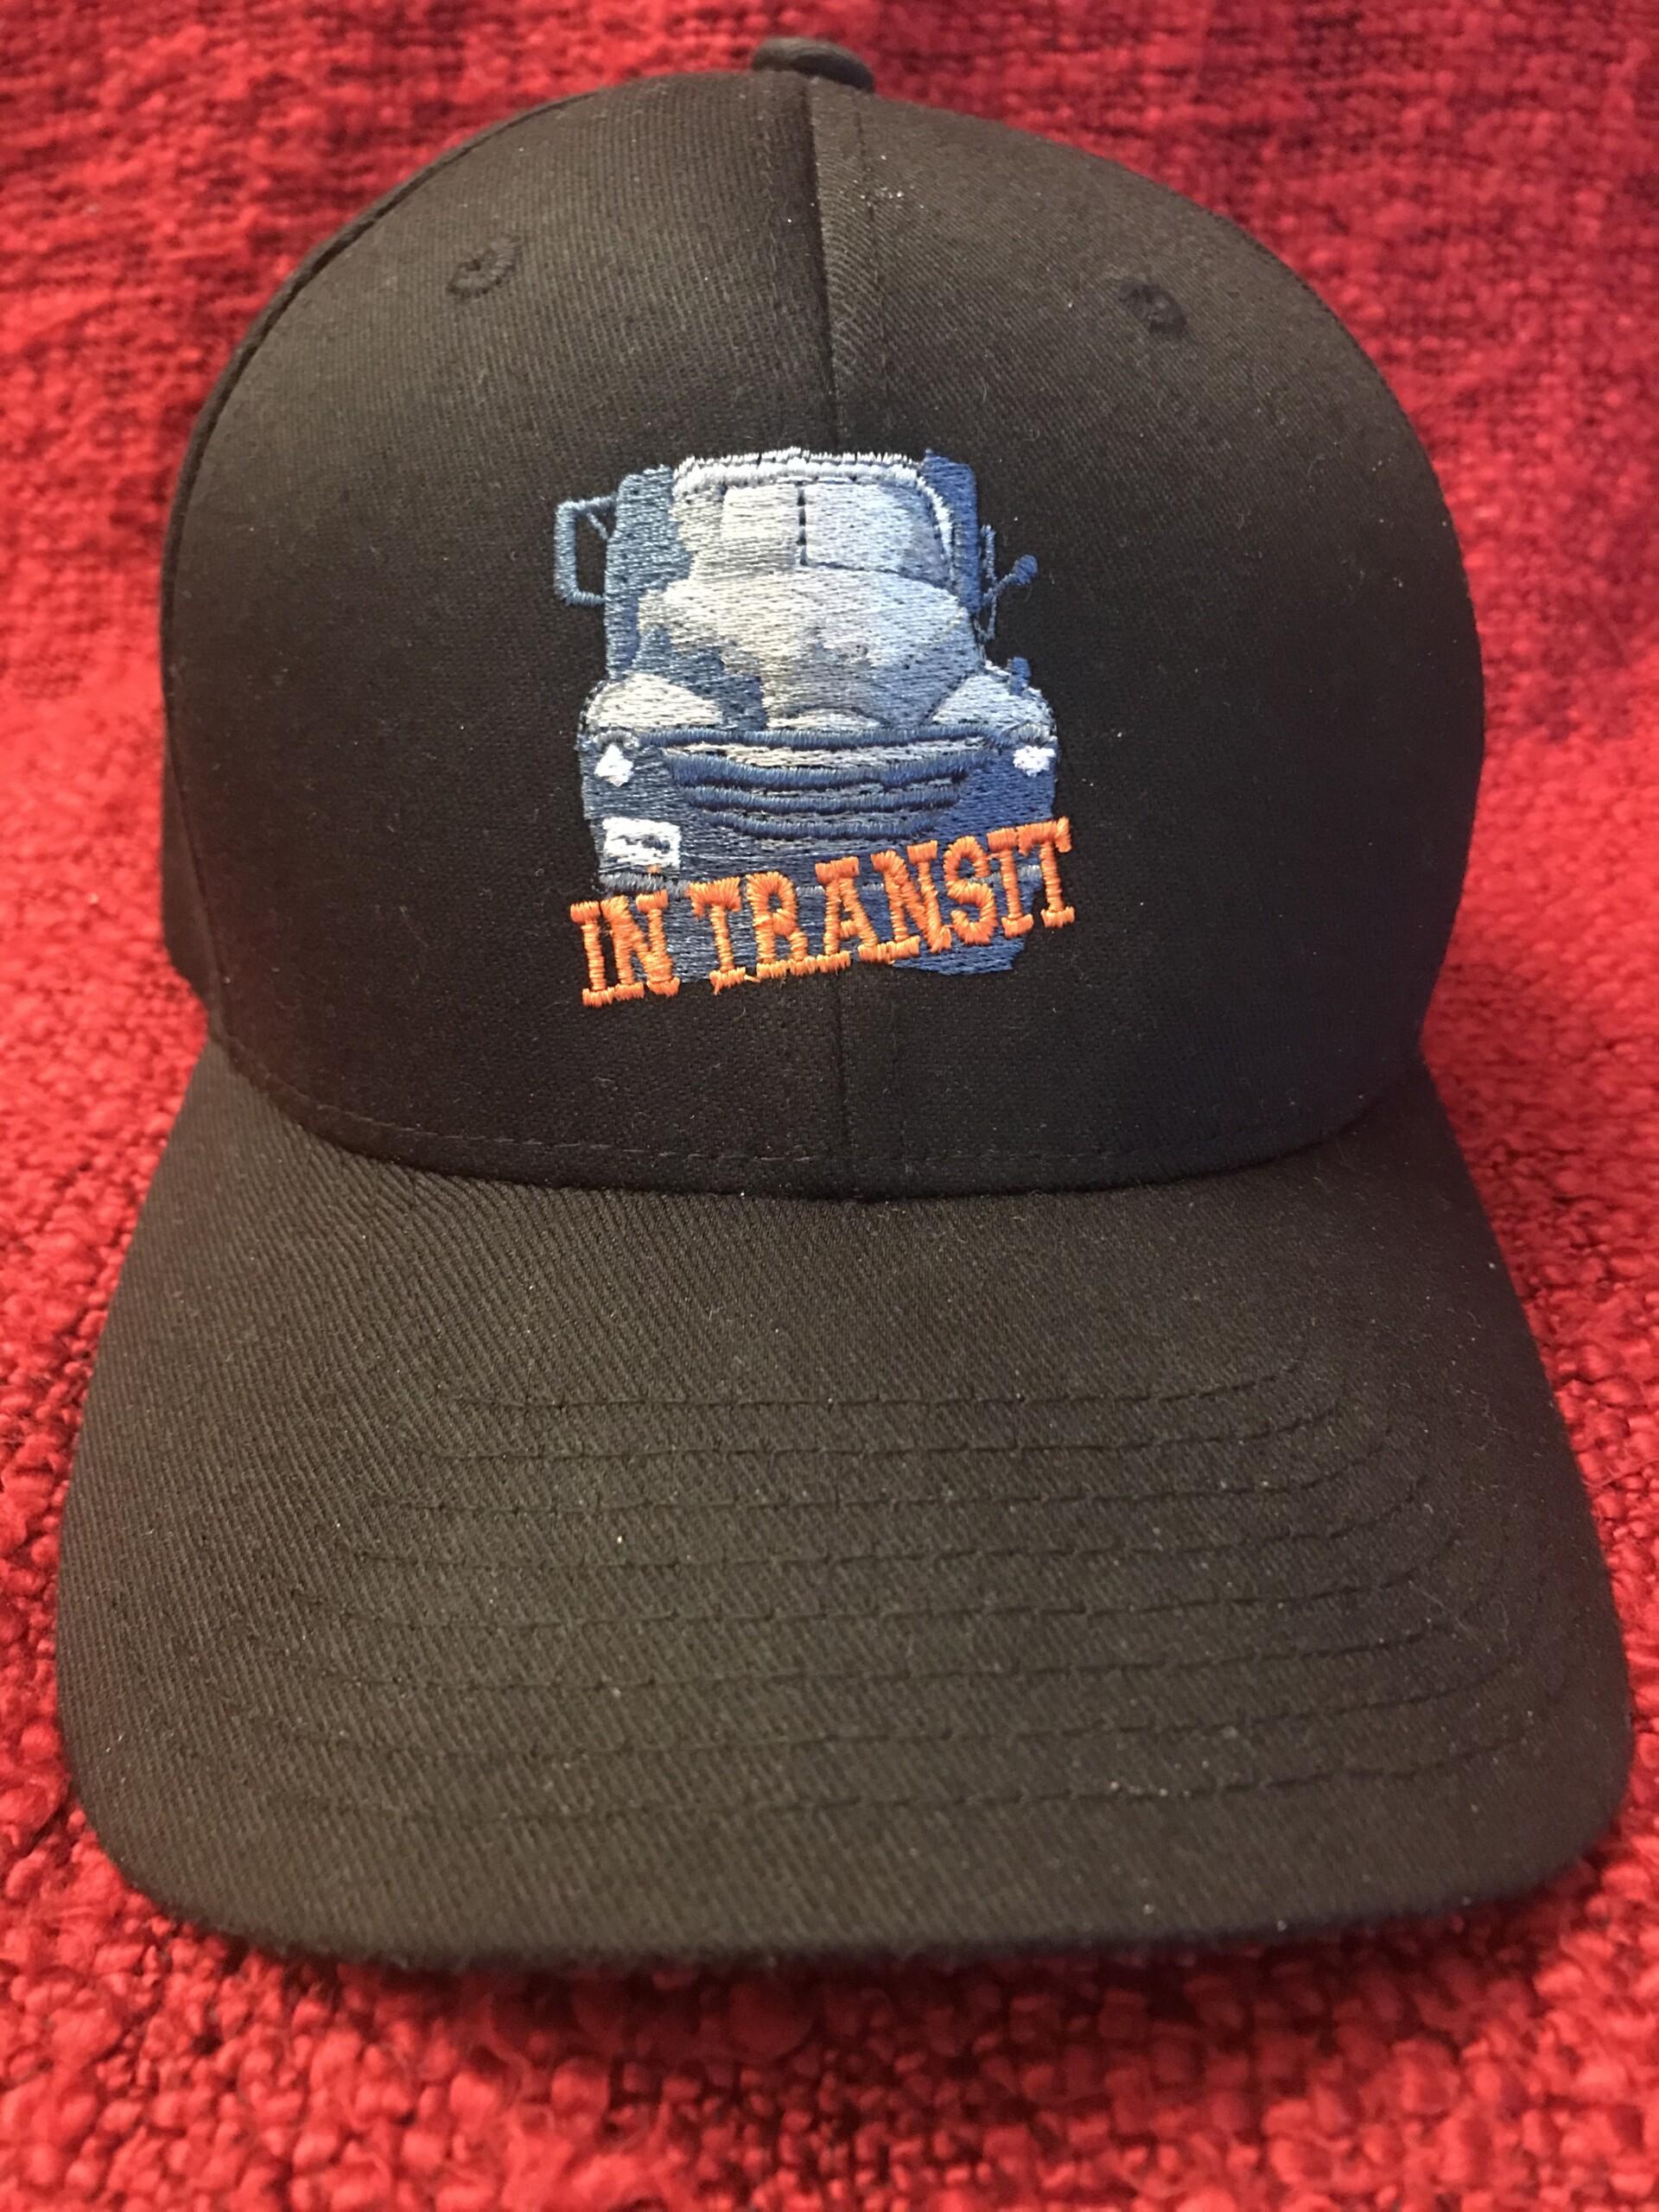 In Transit Logo on Black Hat